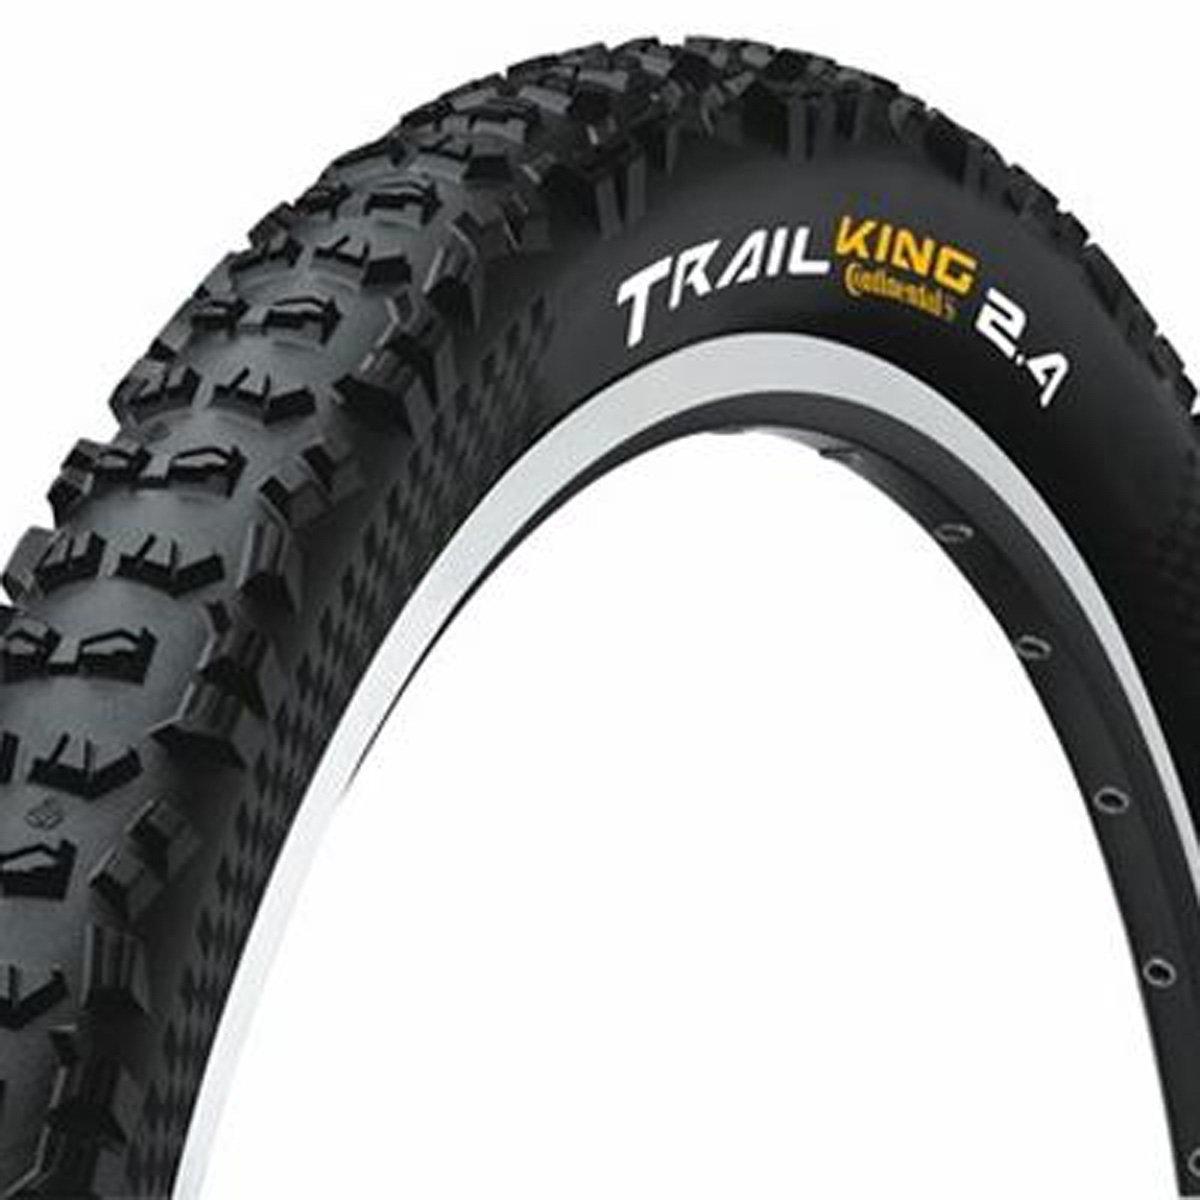 Continental Trail King 29x2.4 ProTection Black Chili Rubber and APEX w/Folding Bead [並行輸入品] B077QH3HP1